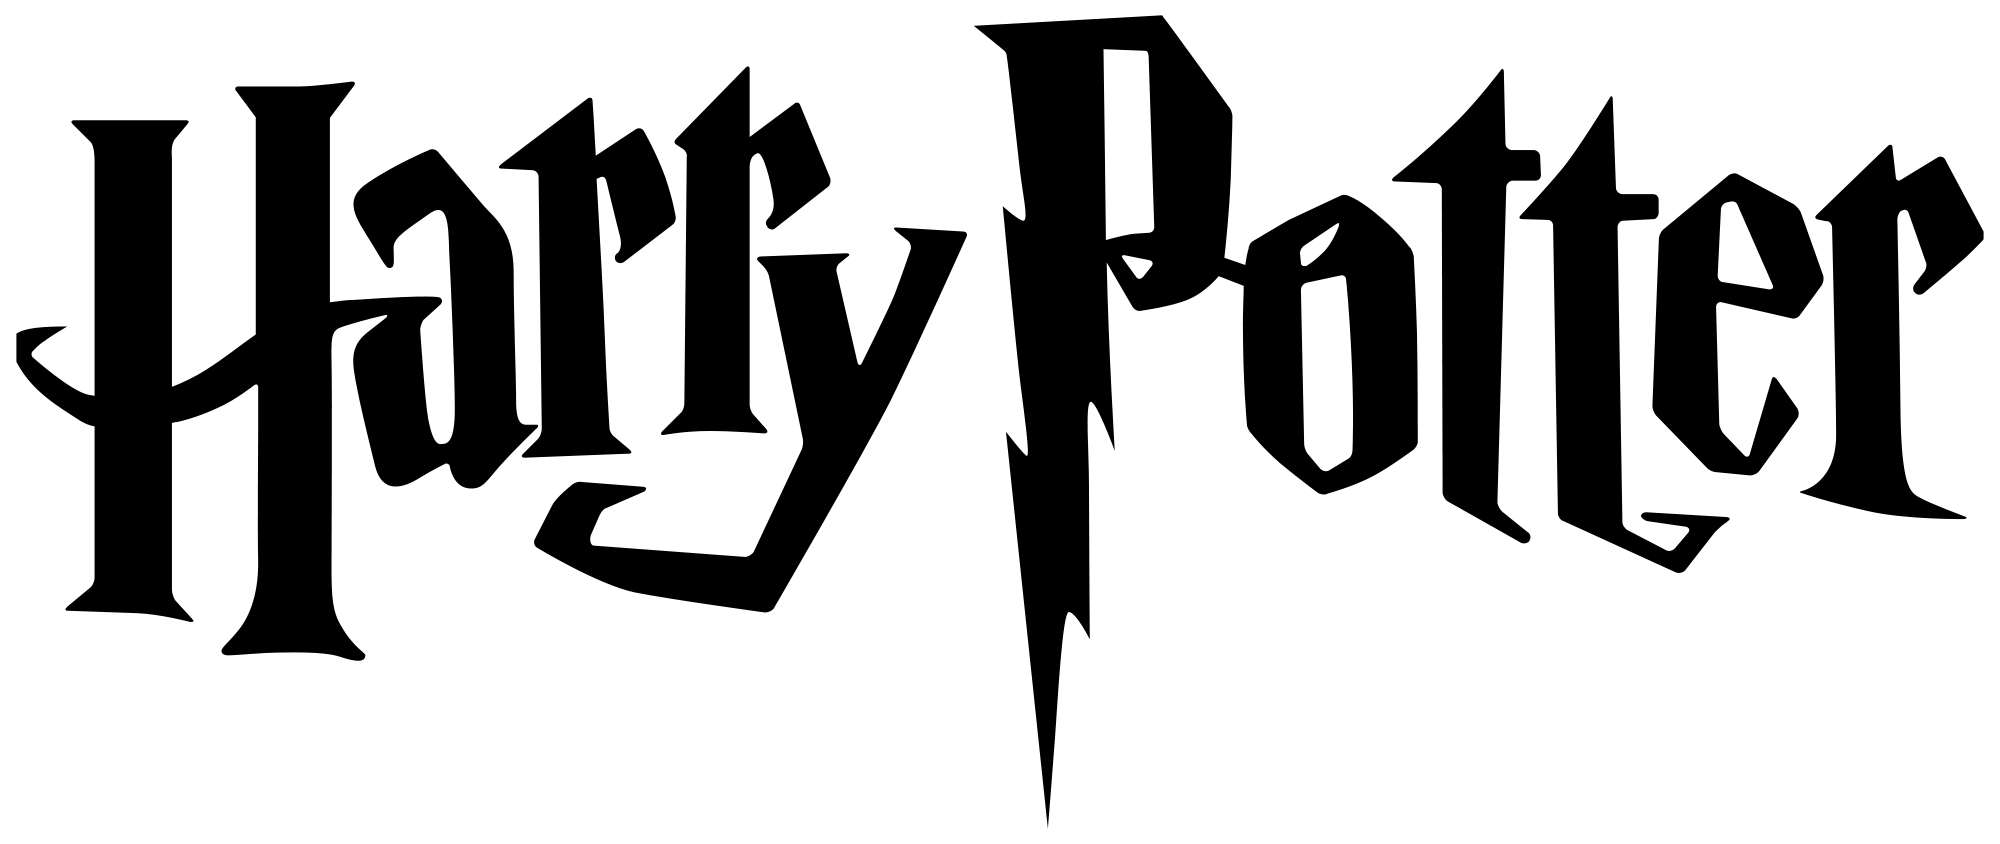 http://vignette1.wikia.nocookie.net/jspotter/images/f/f9/2000px-Harrypotter-series-logo_svg.png/revision/latest?cb=20150204044717